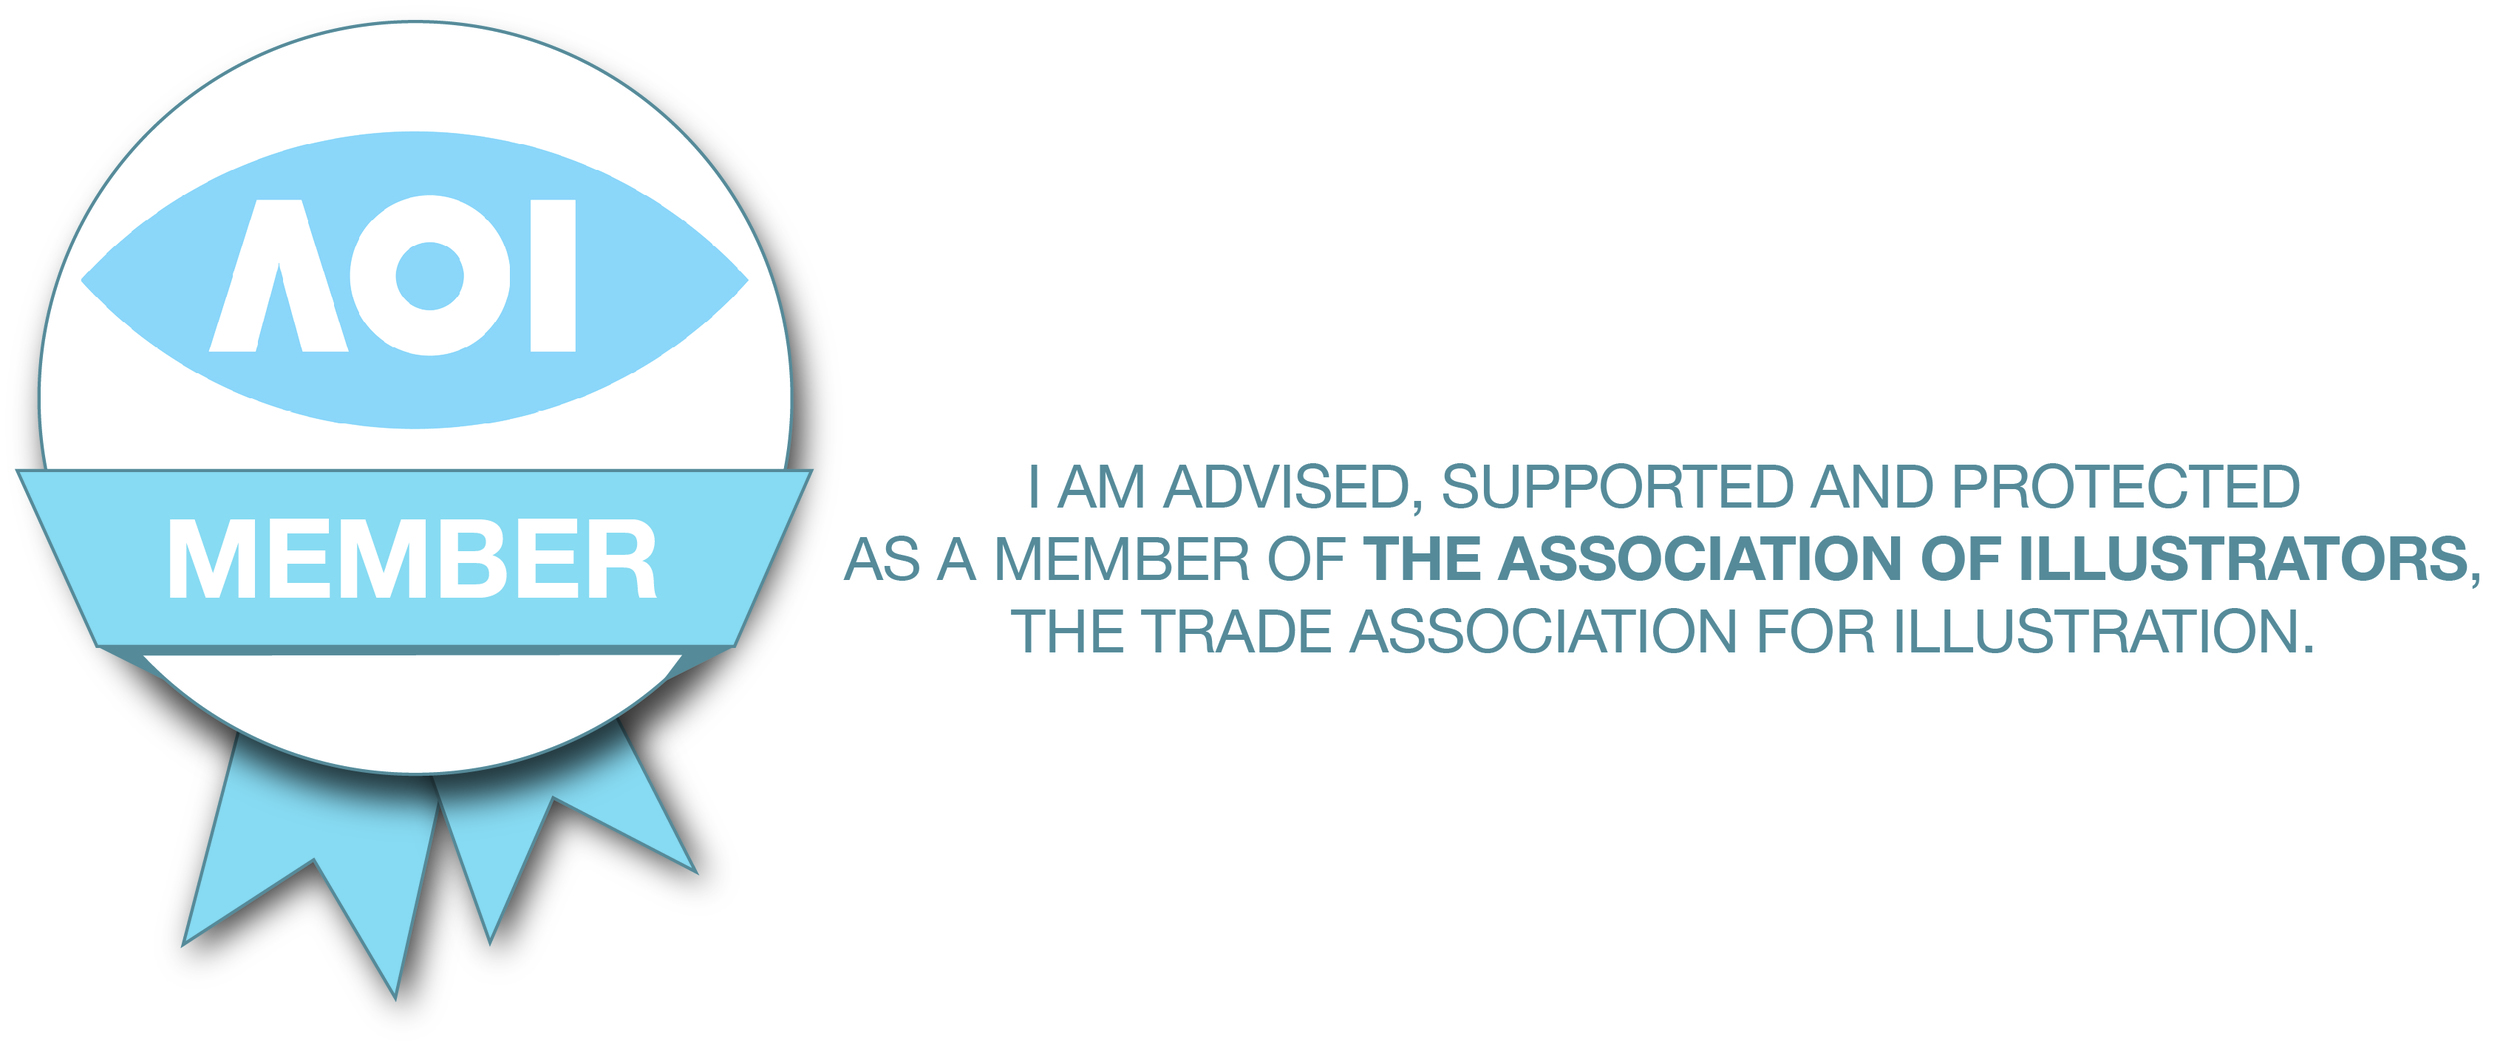 AOI Member Logo and Text.jpg